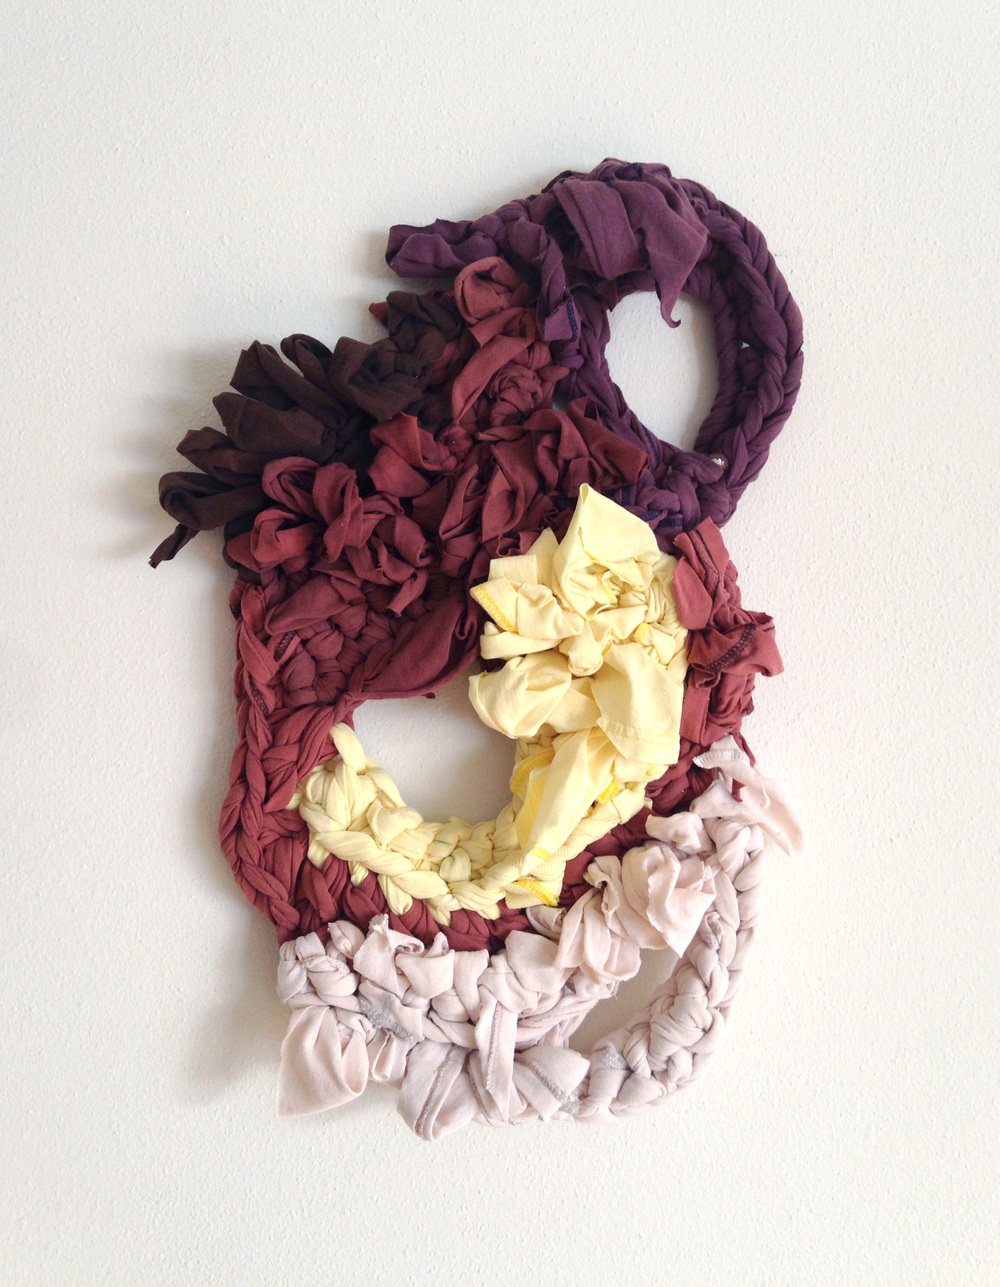 "Humilis 24 x 15 x 3"", reclaimed fabric, 2014"